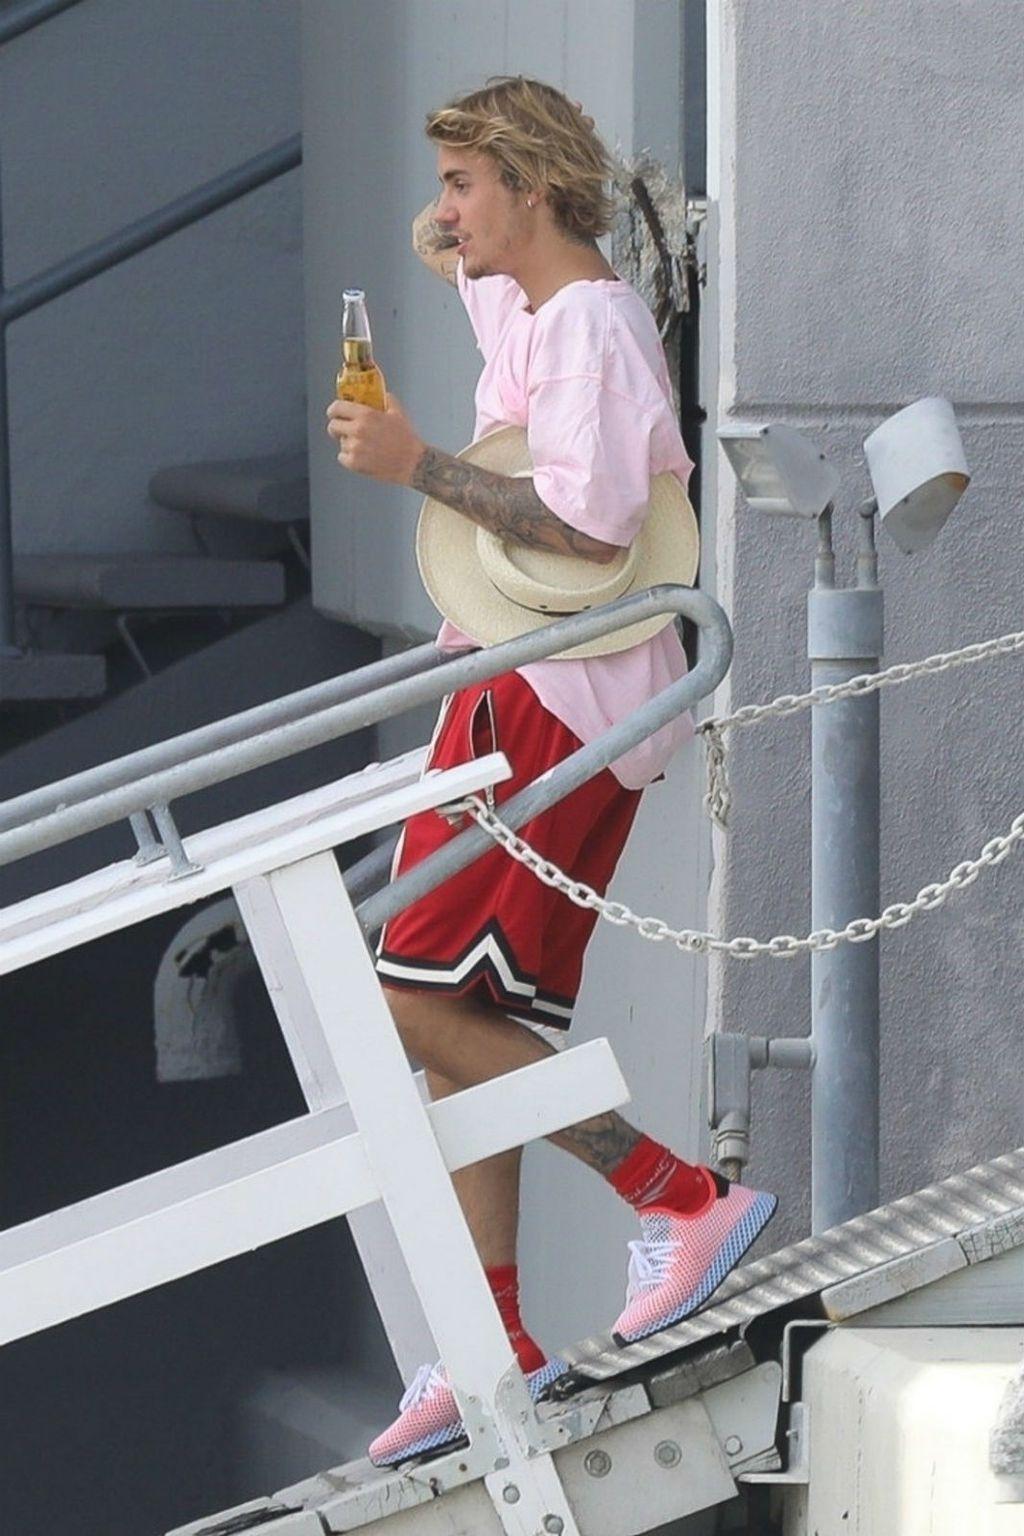 I Justin Bieber voli nositi ove tenisice